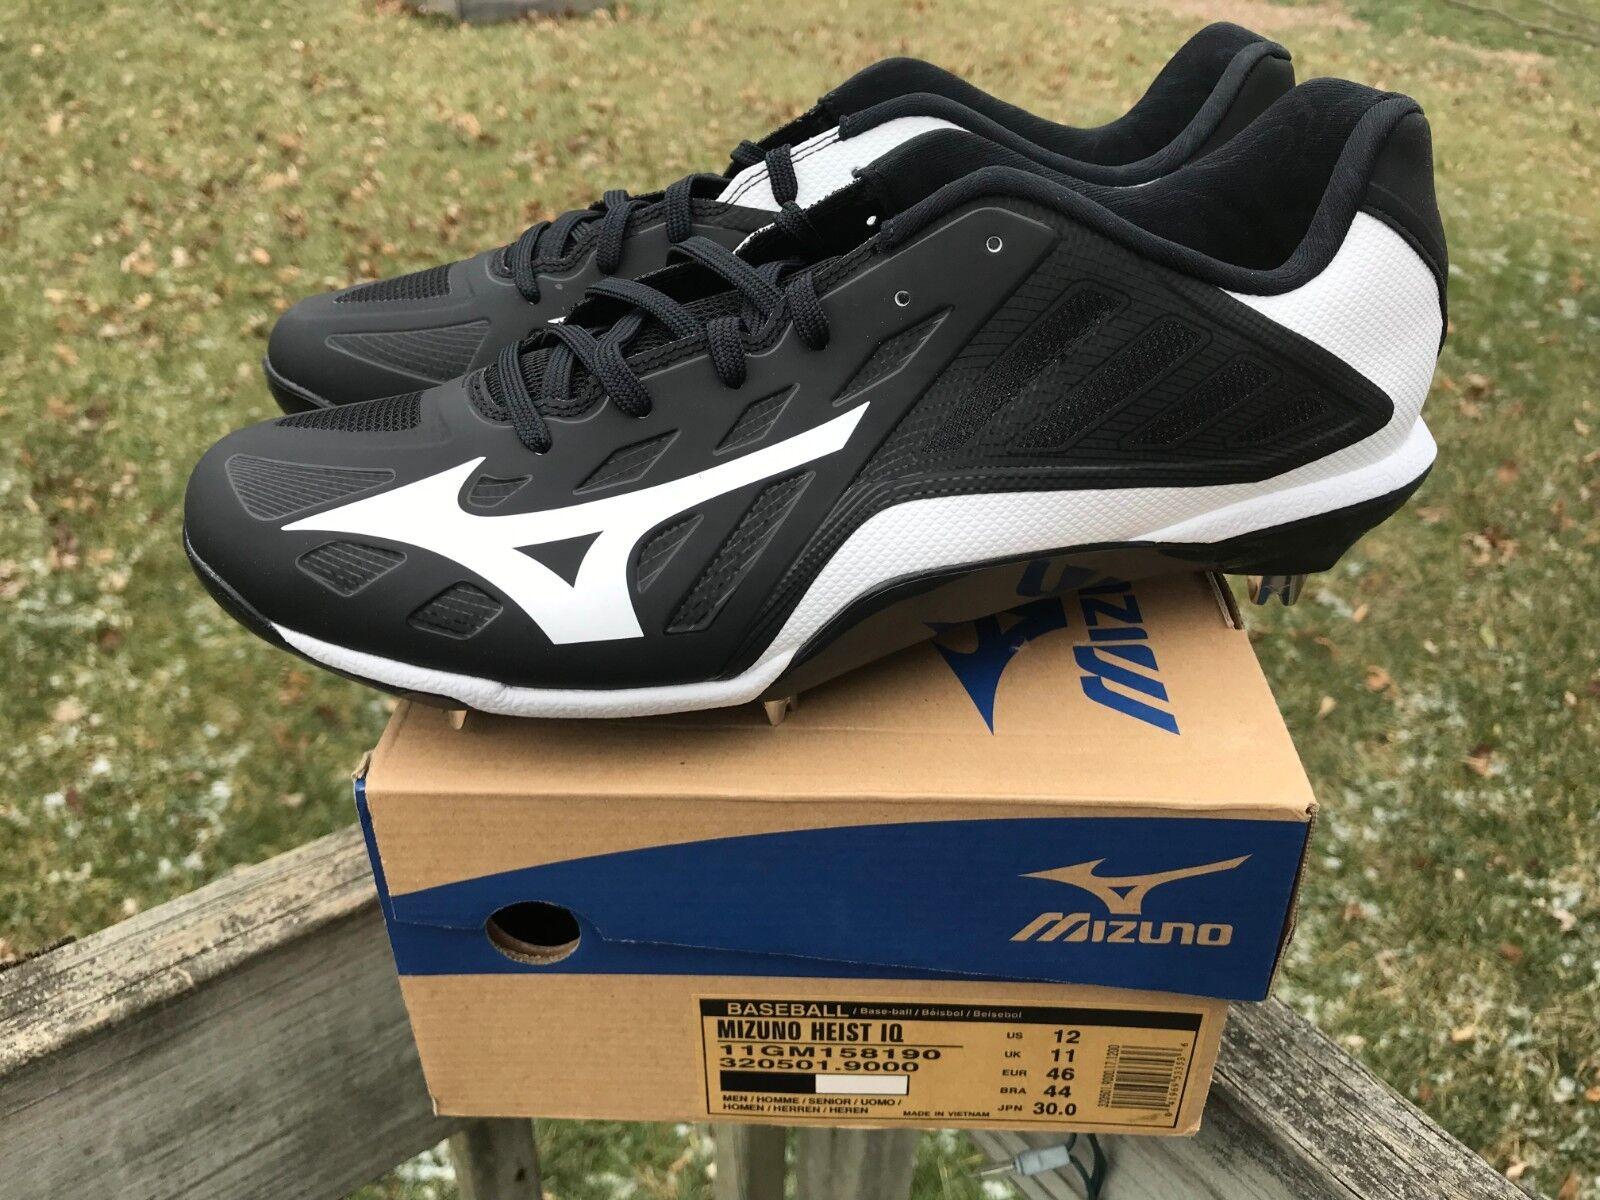 online store 853fa acd5b Mizuno Heist IQ Low Mens Baseball Cleats Black-white 12 for sale online   eBay